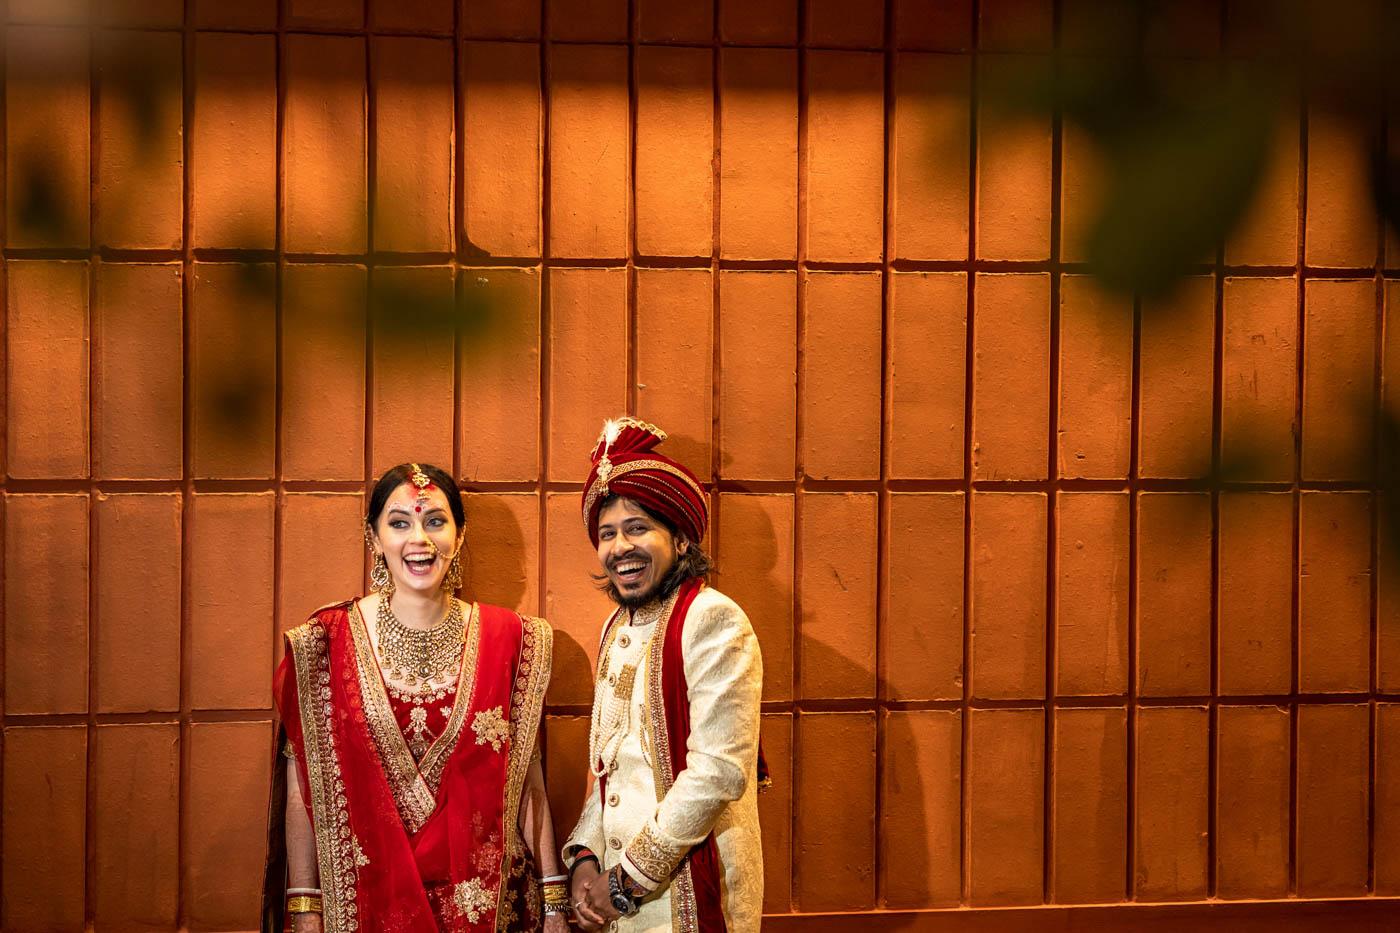 Charlotte & Sunam - A Bengali-British Love Story